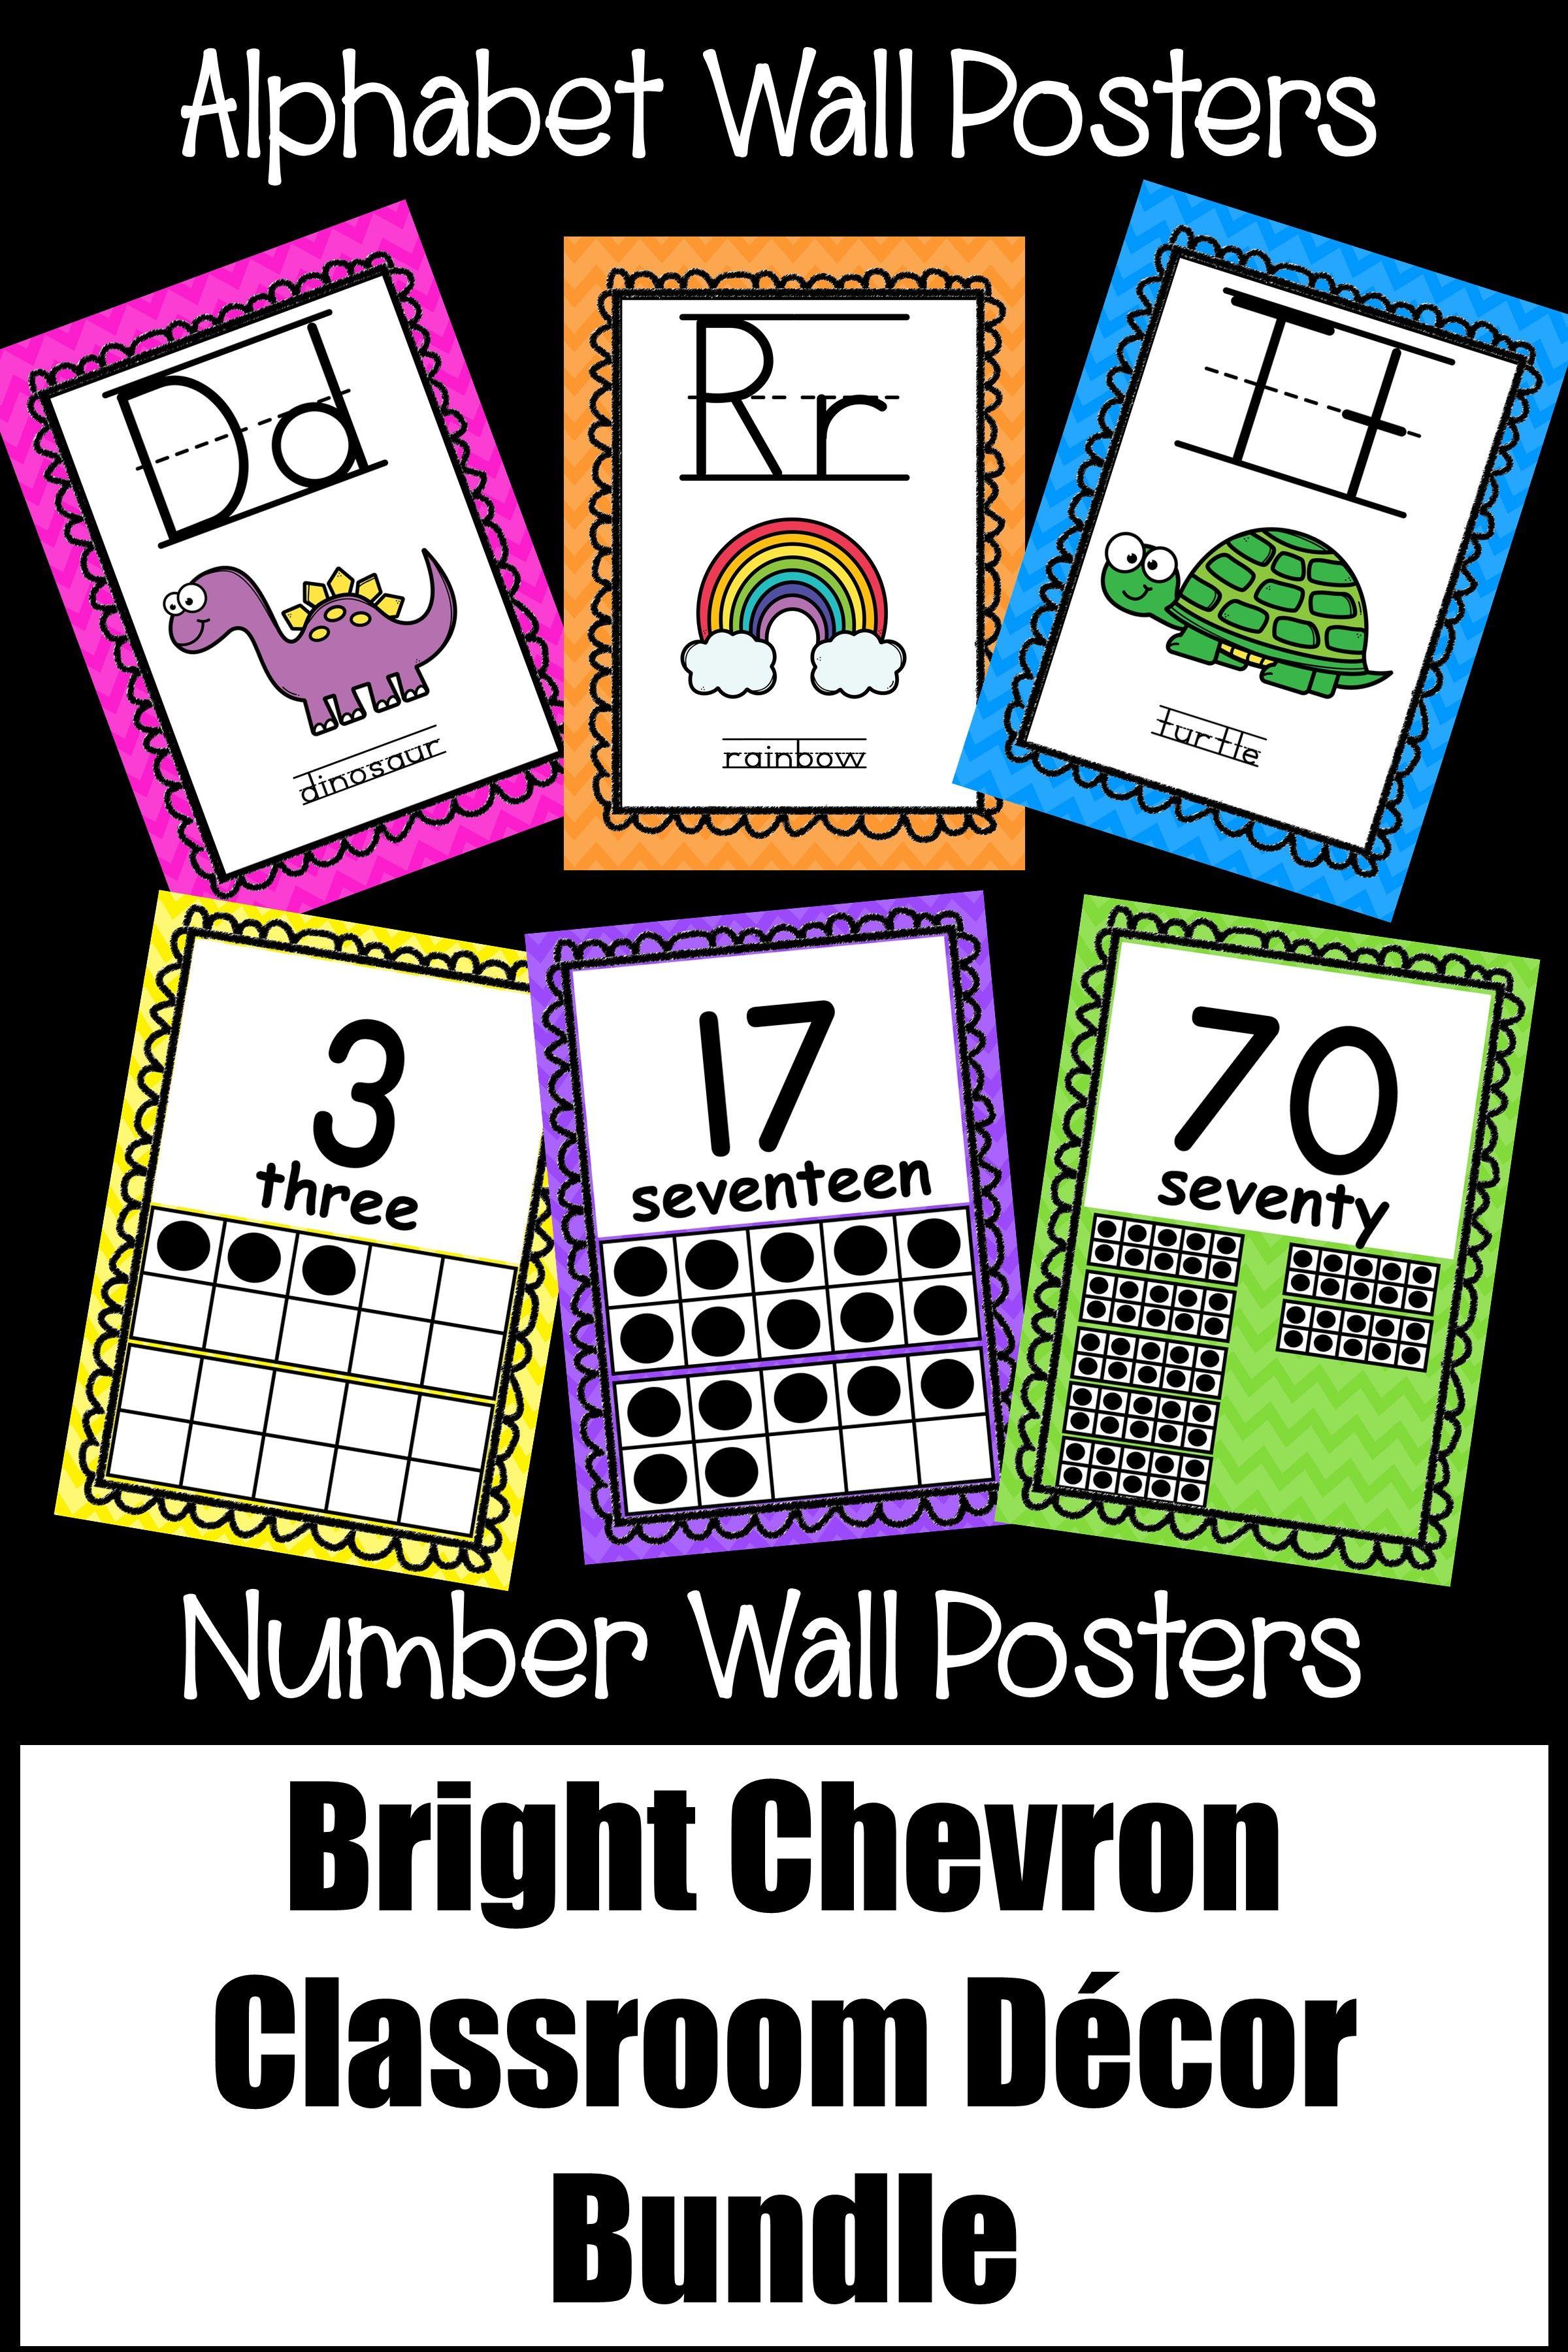 Bright Chevron Classroom Theme Decor Bundle